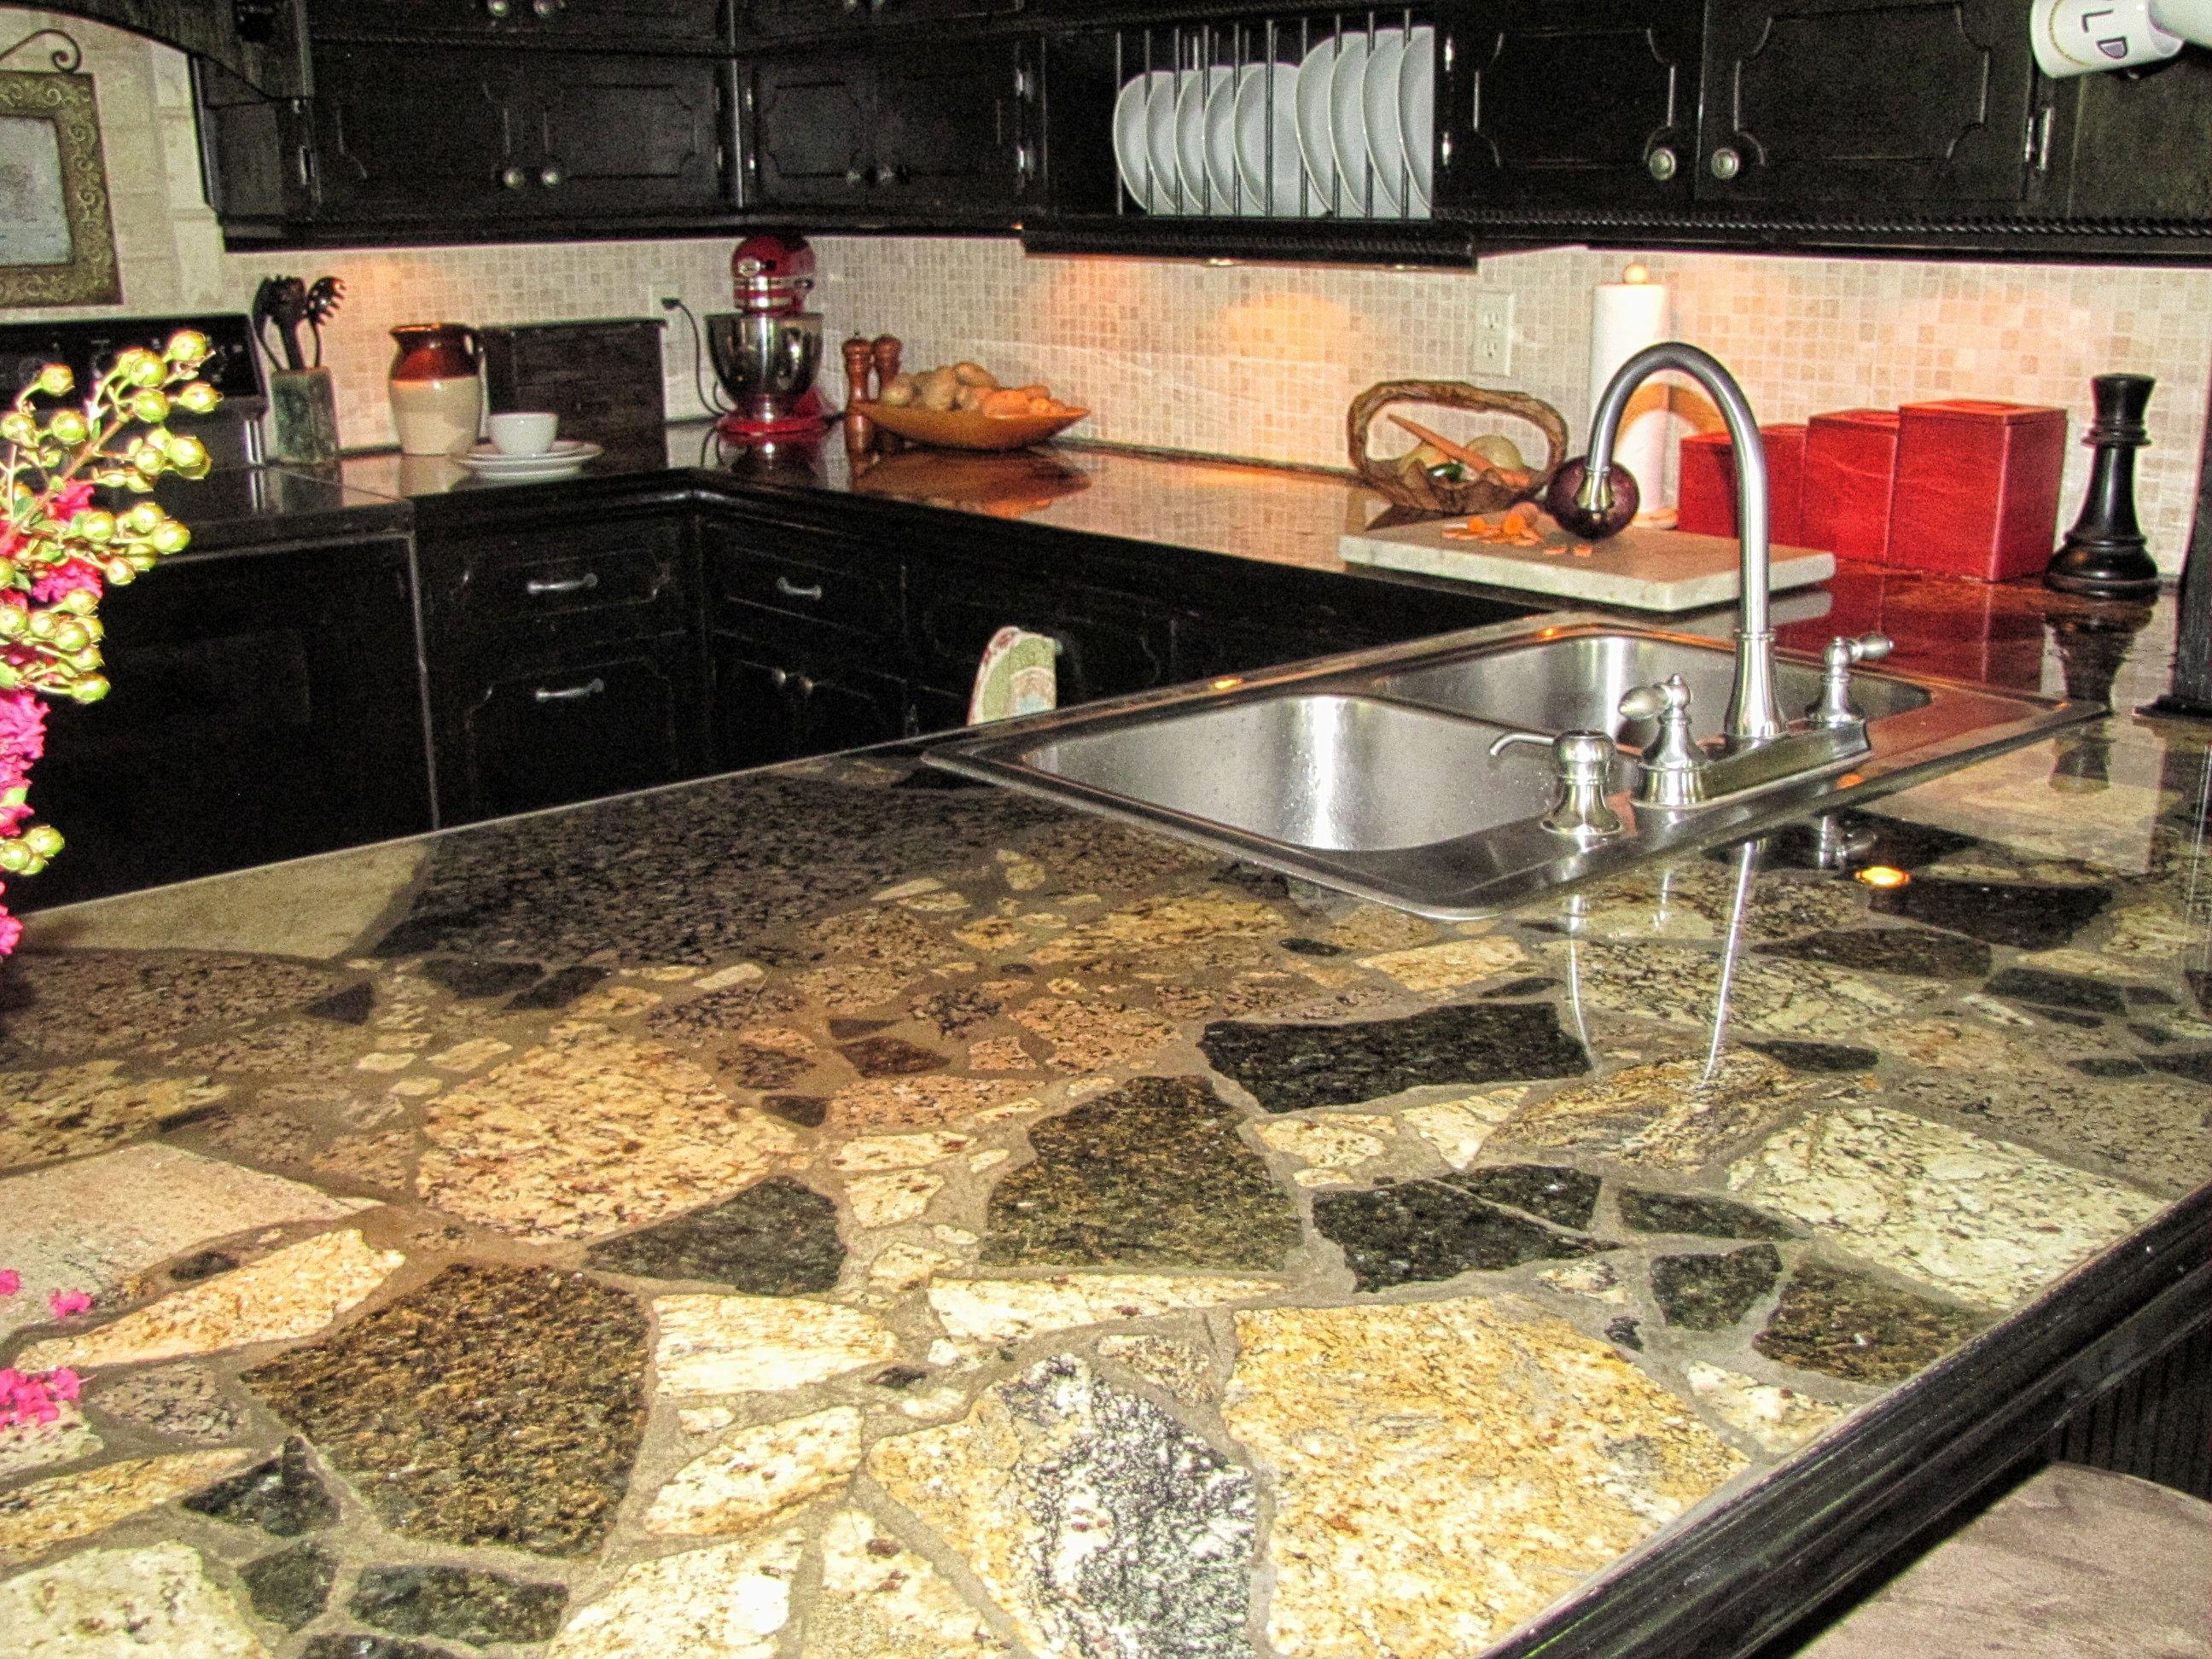 Epoxy Countertops Counter Top Epoxy Epoxy Countertop Kitchen Countertops Countertops